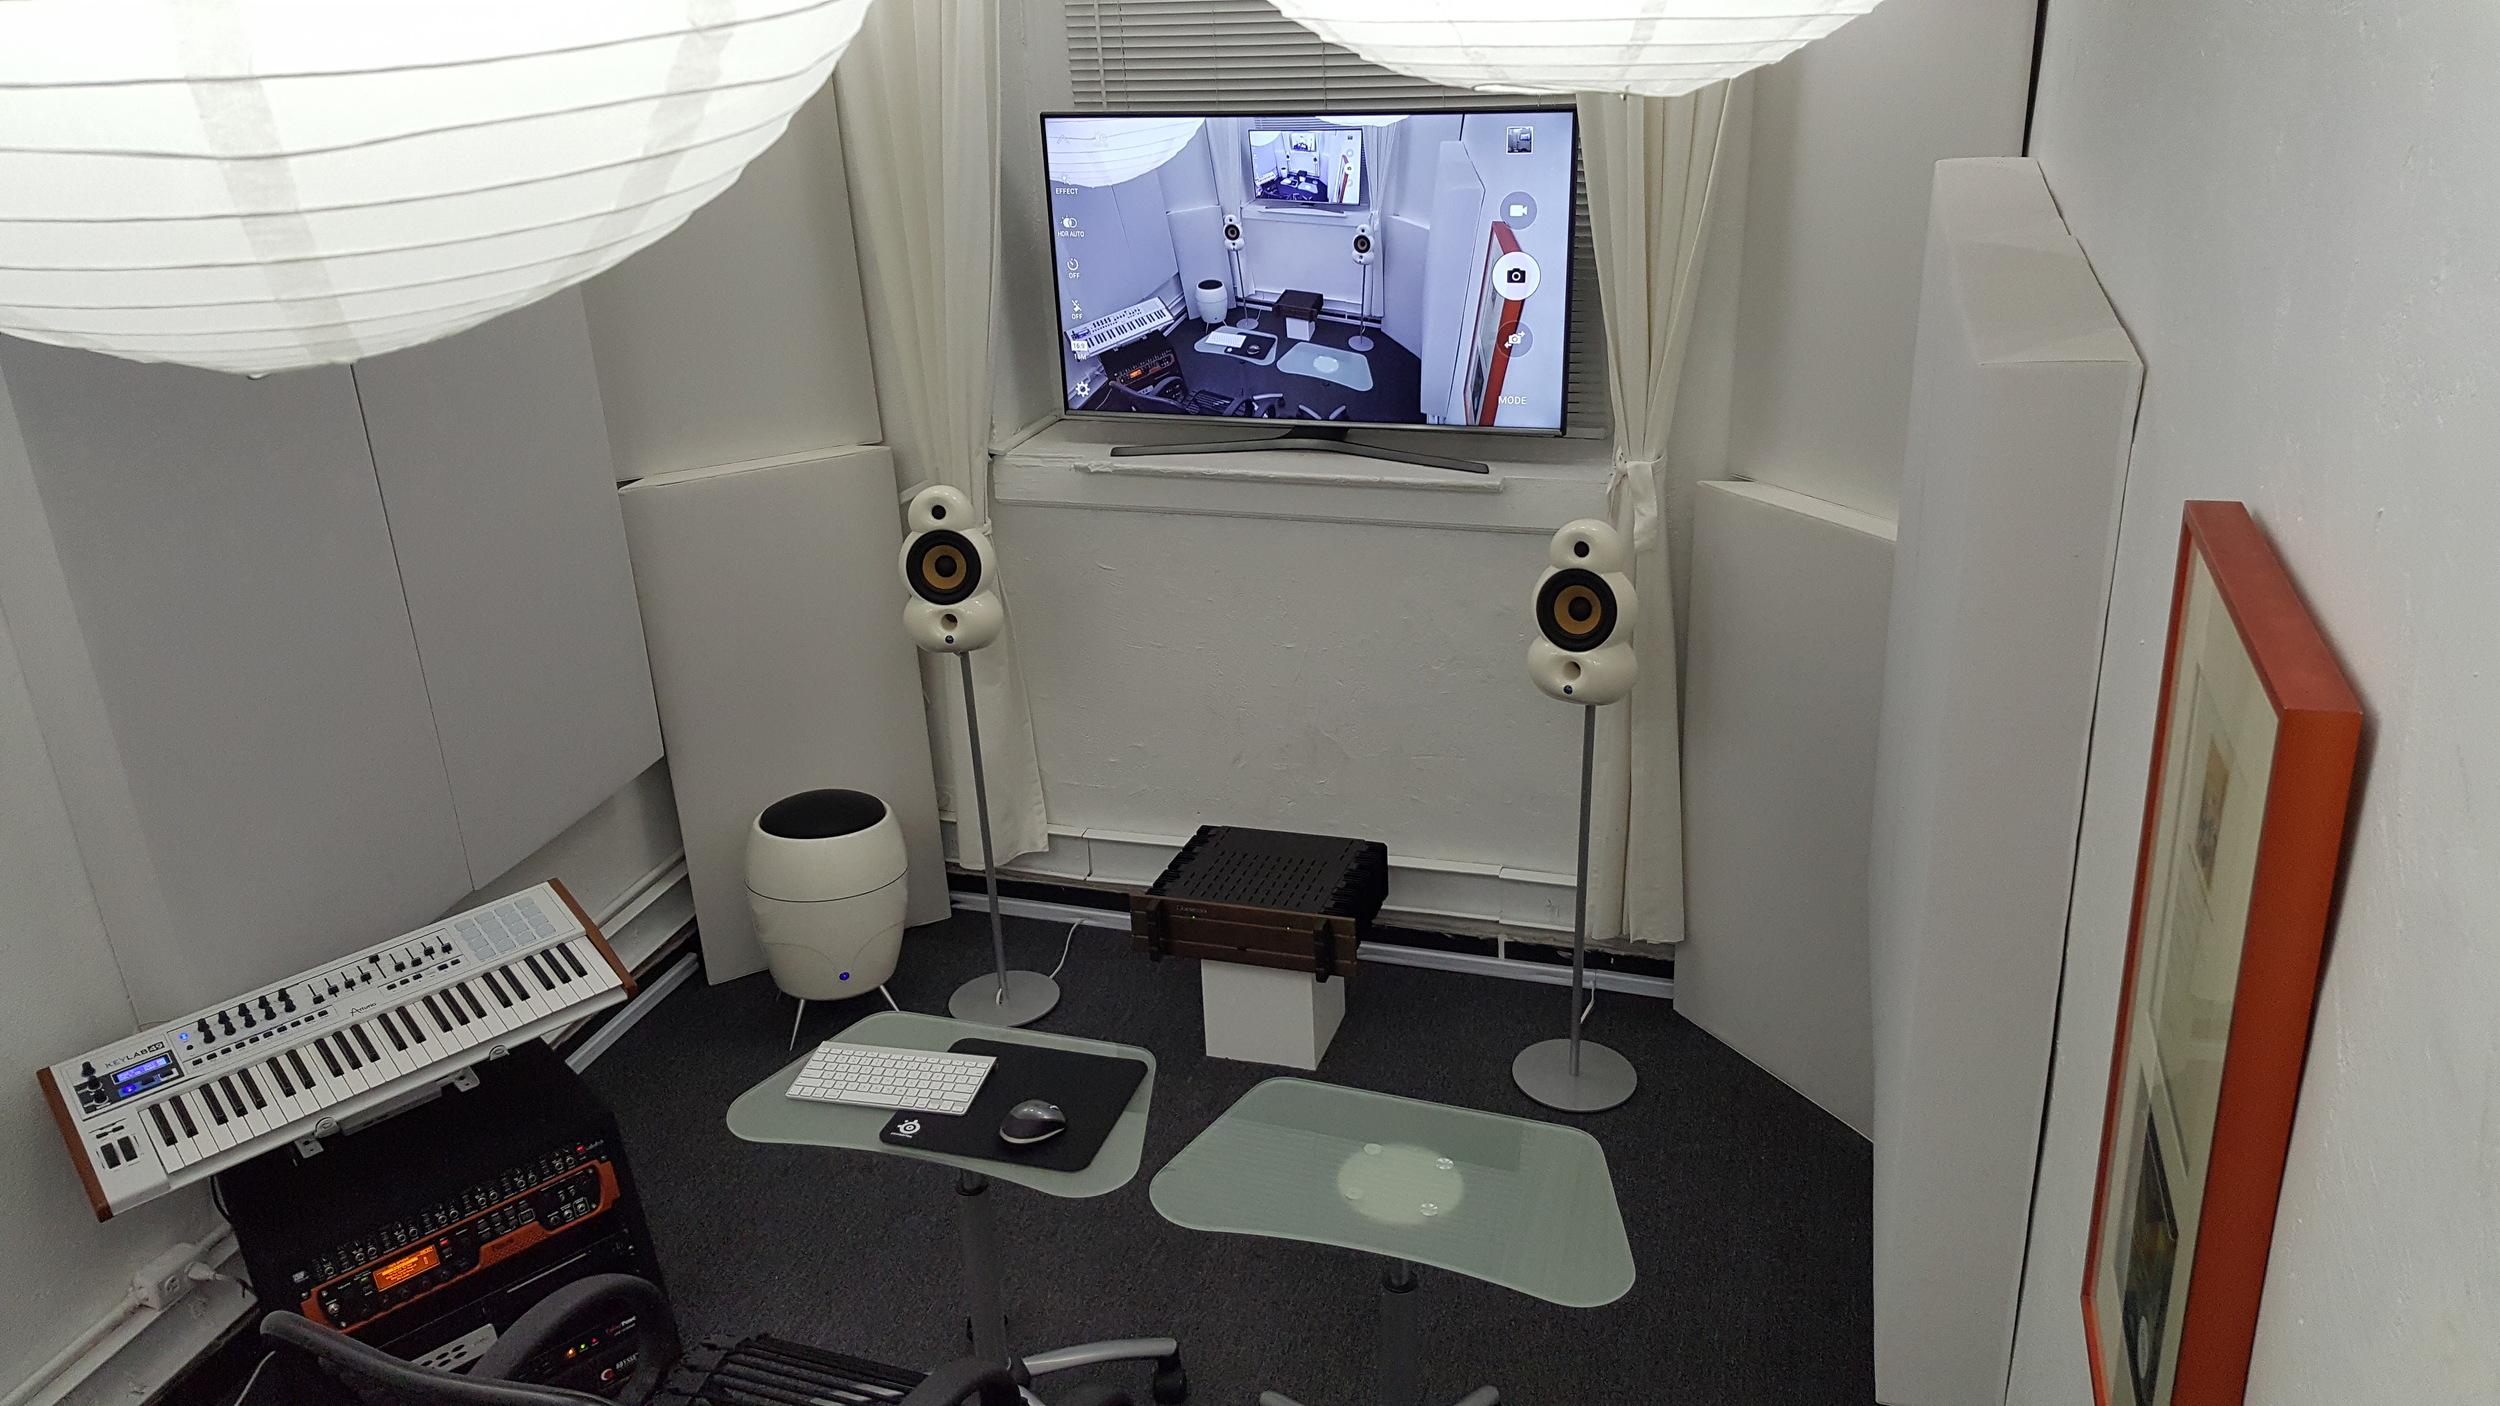 STUDIO B - PRODUCTION & WRITING ROOM